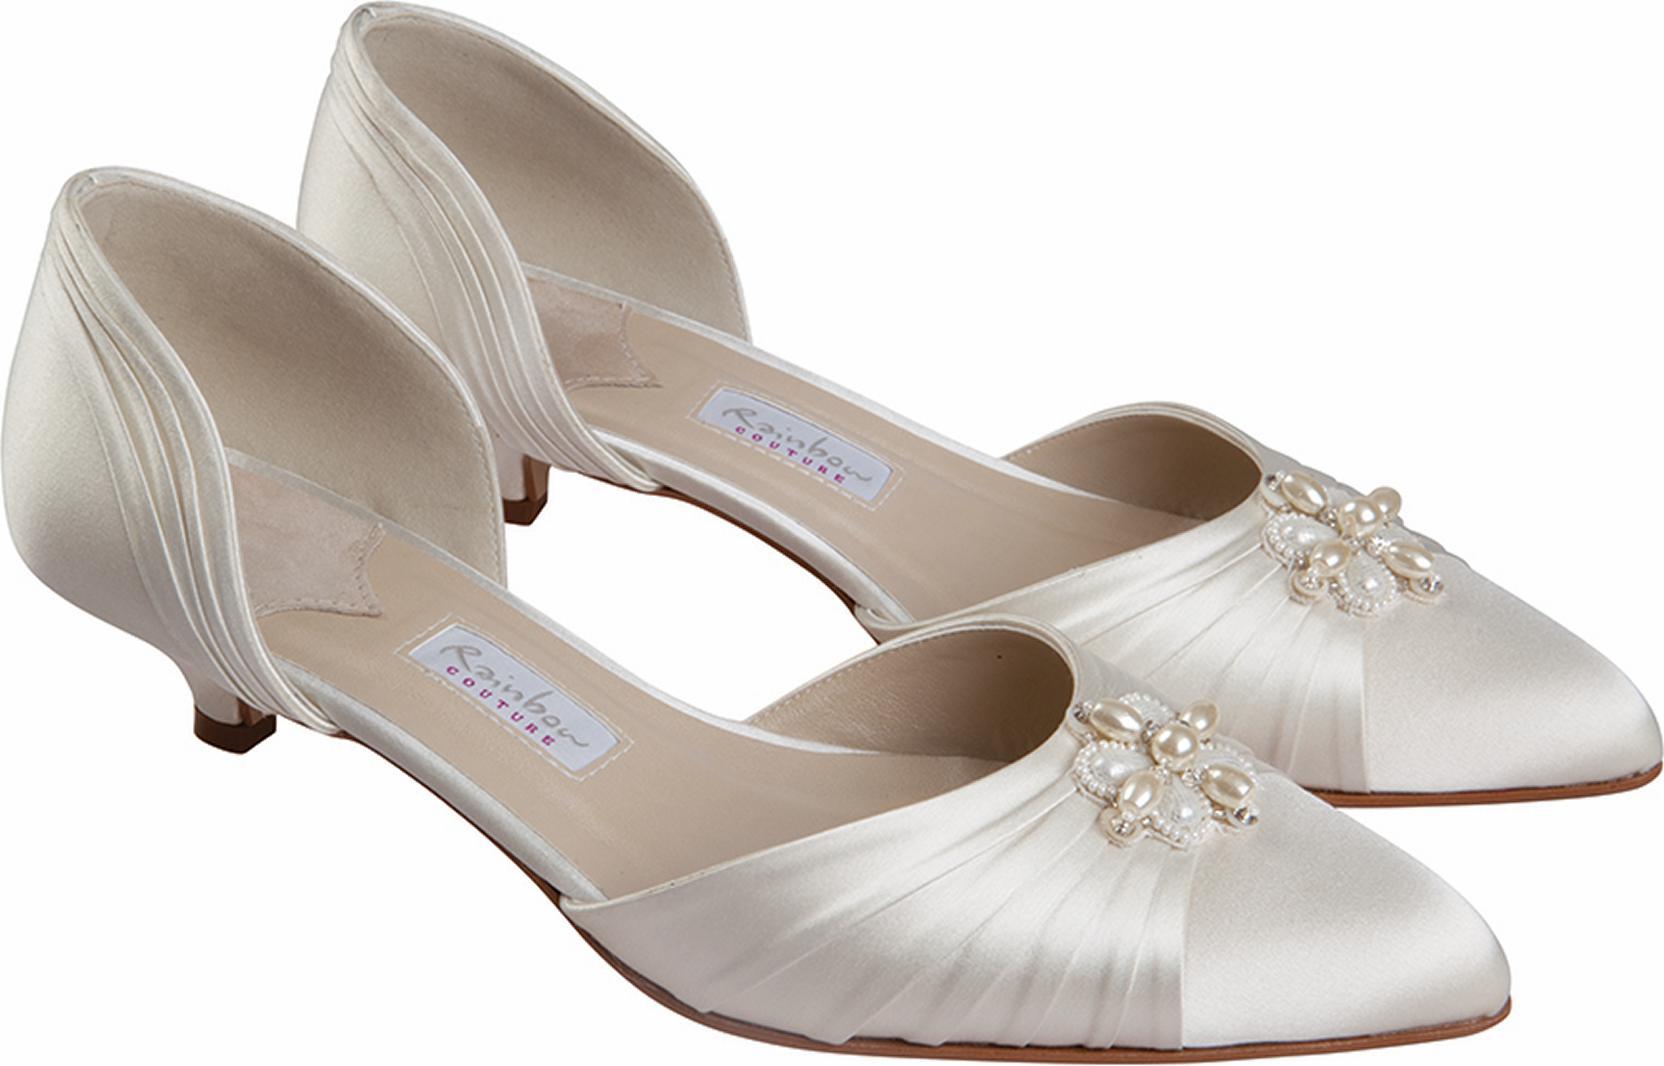 DELANO - Rainbow Couture cipő. 29.500 Ft. 3,5 cm sarok.